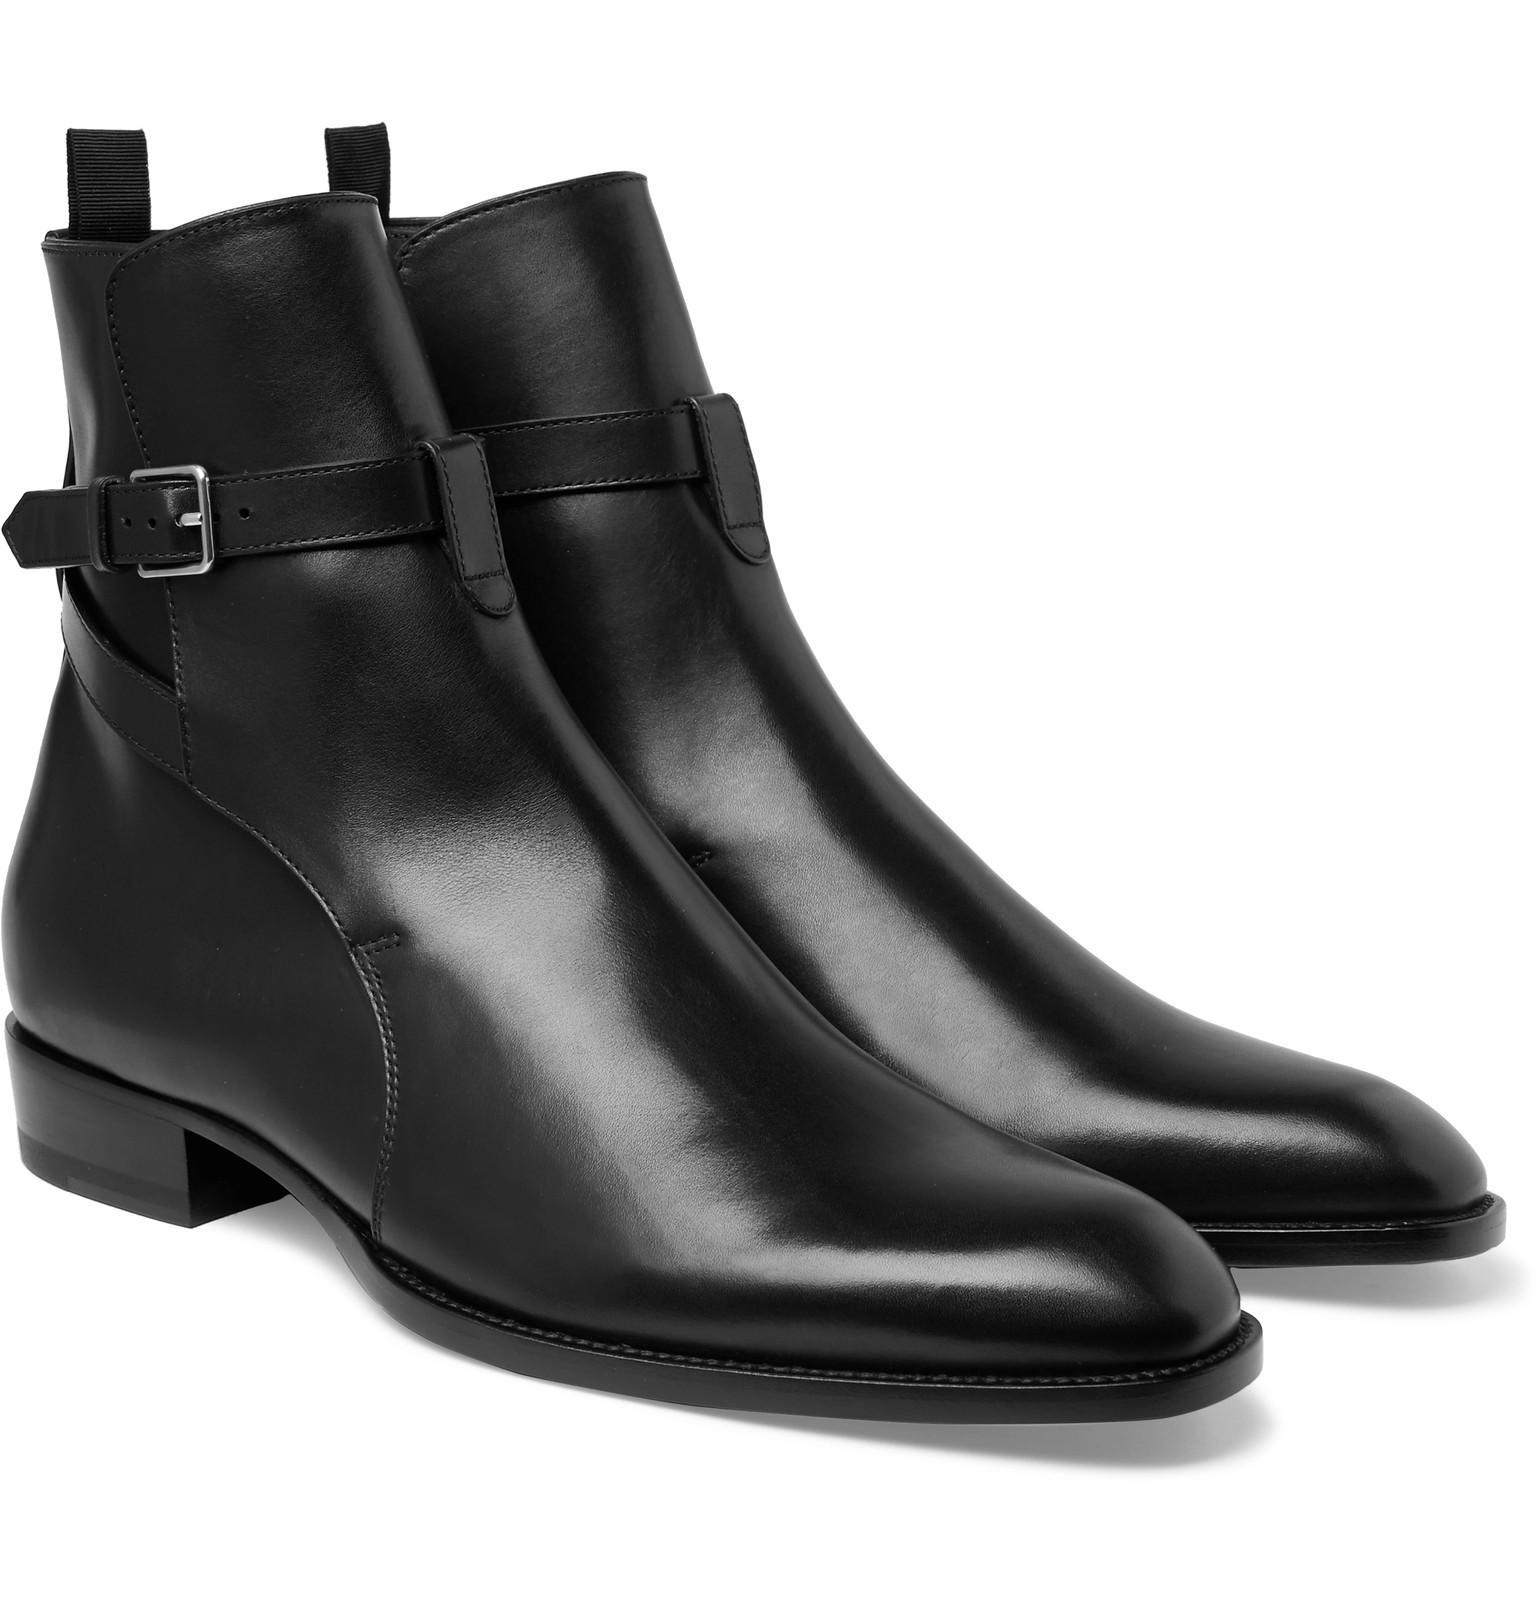 Saint Laurent Leather Jodhpur Boots cheap price free shipping dQBMI0